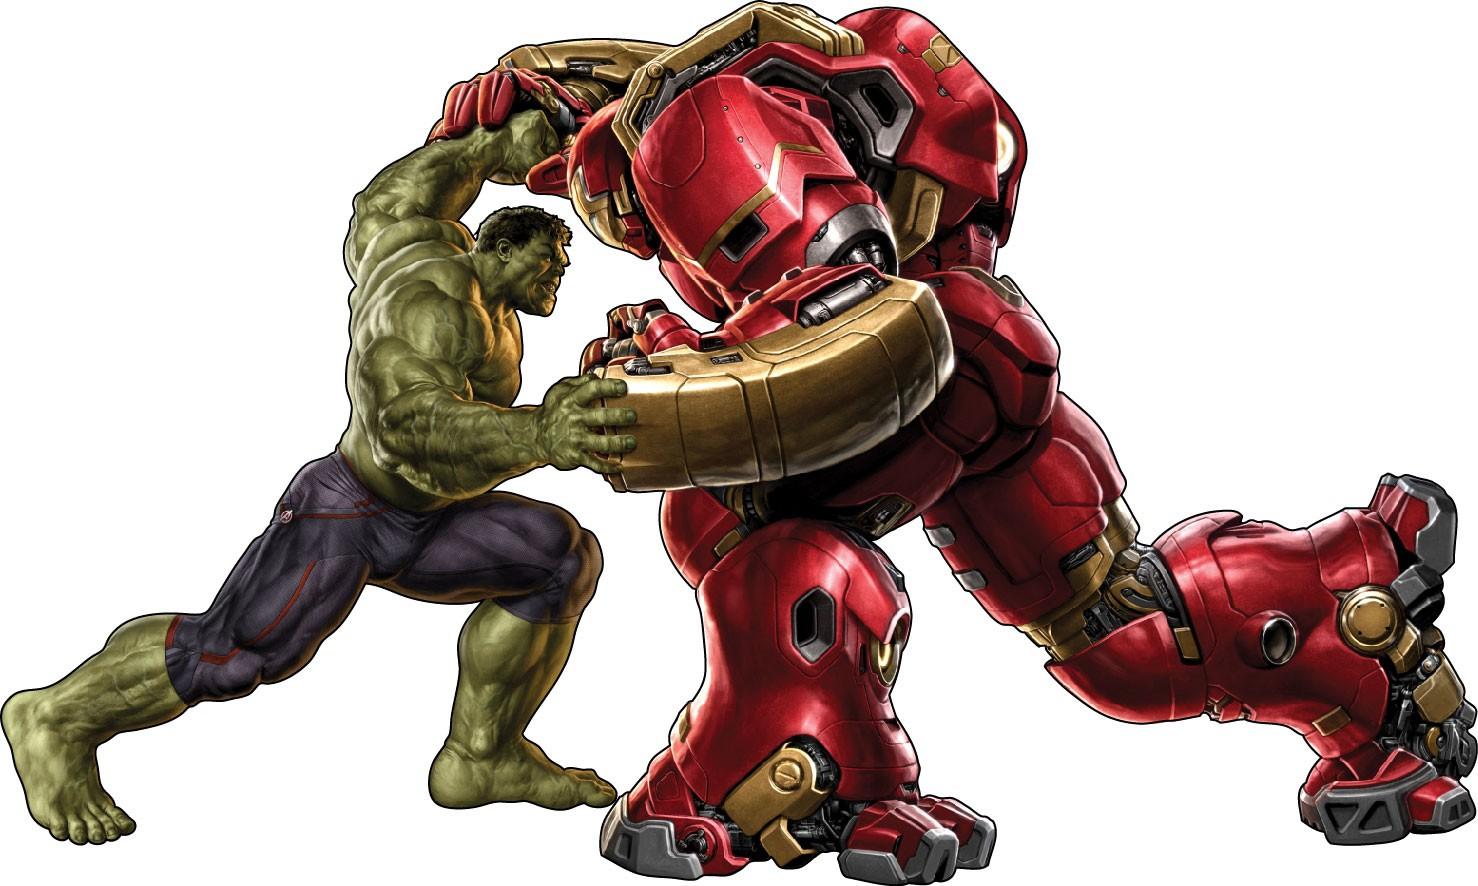 Stickers enfant hulk vs hulkbuster iron man réf 15012 stickers muraux enfant